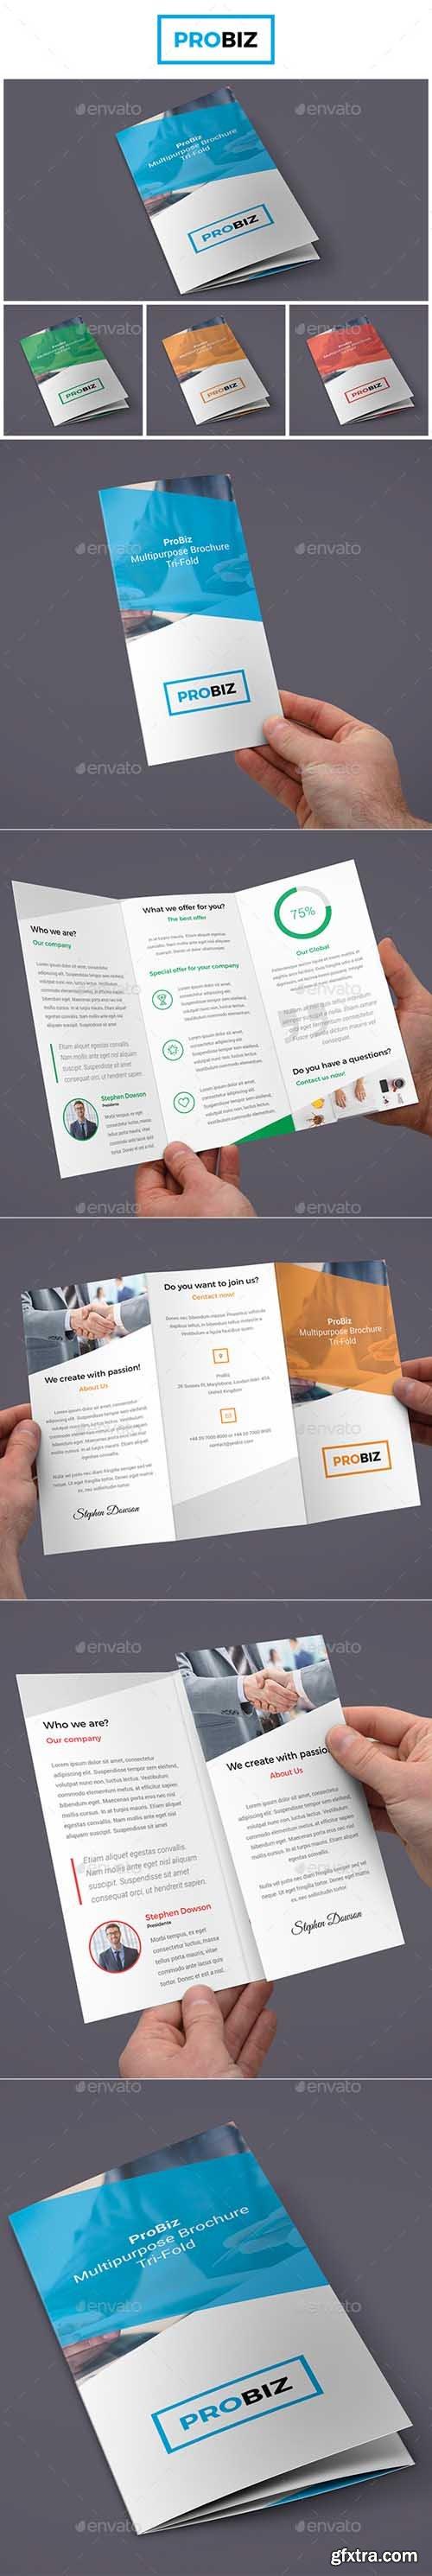 GR - ProBiz – Business and Corporate Brochure Tri-Fold 19017576